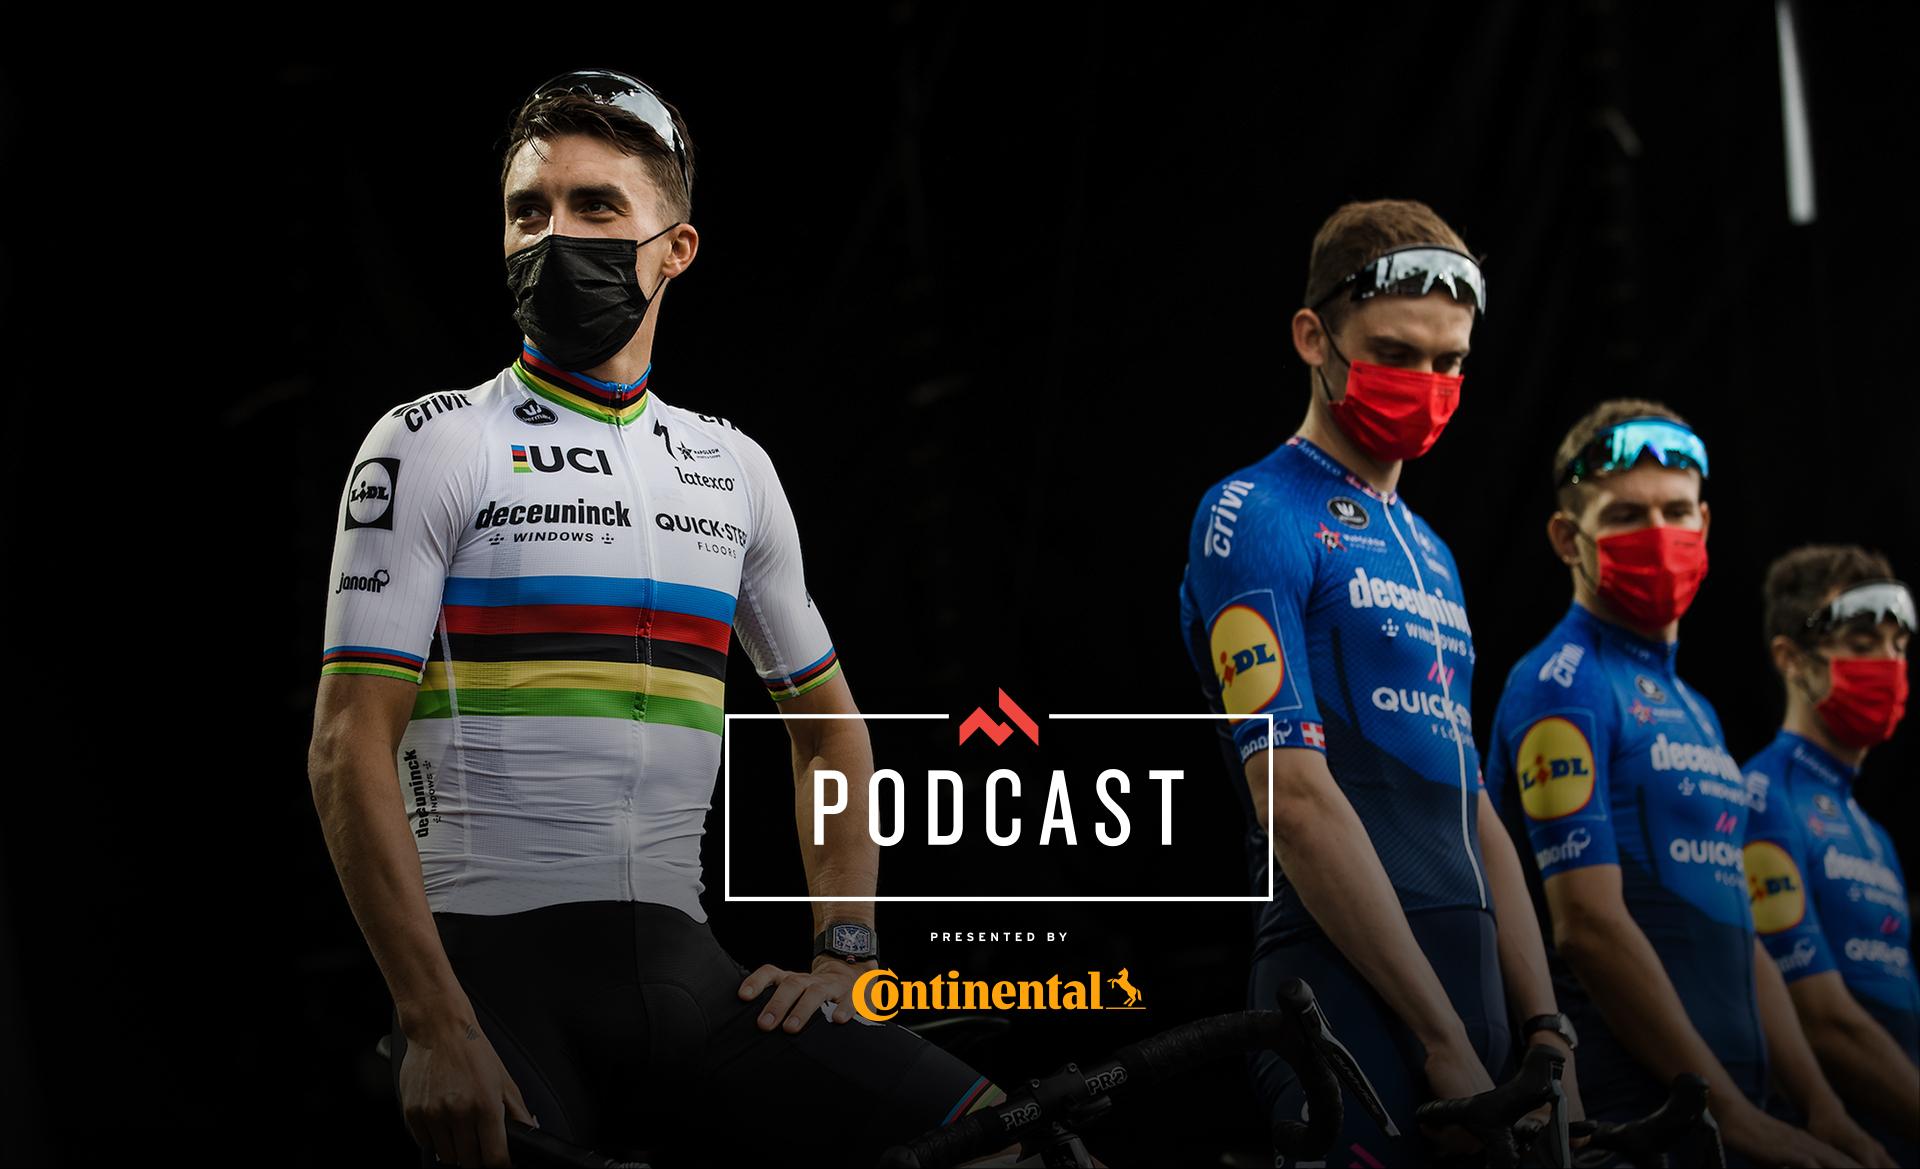 CyclingTips Tour Podcast giornaliero: carneficina sul palco 1